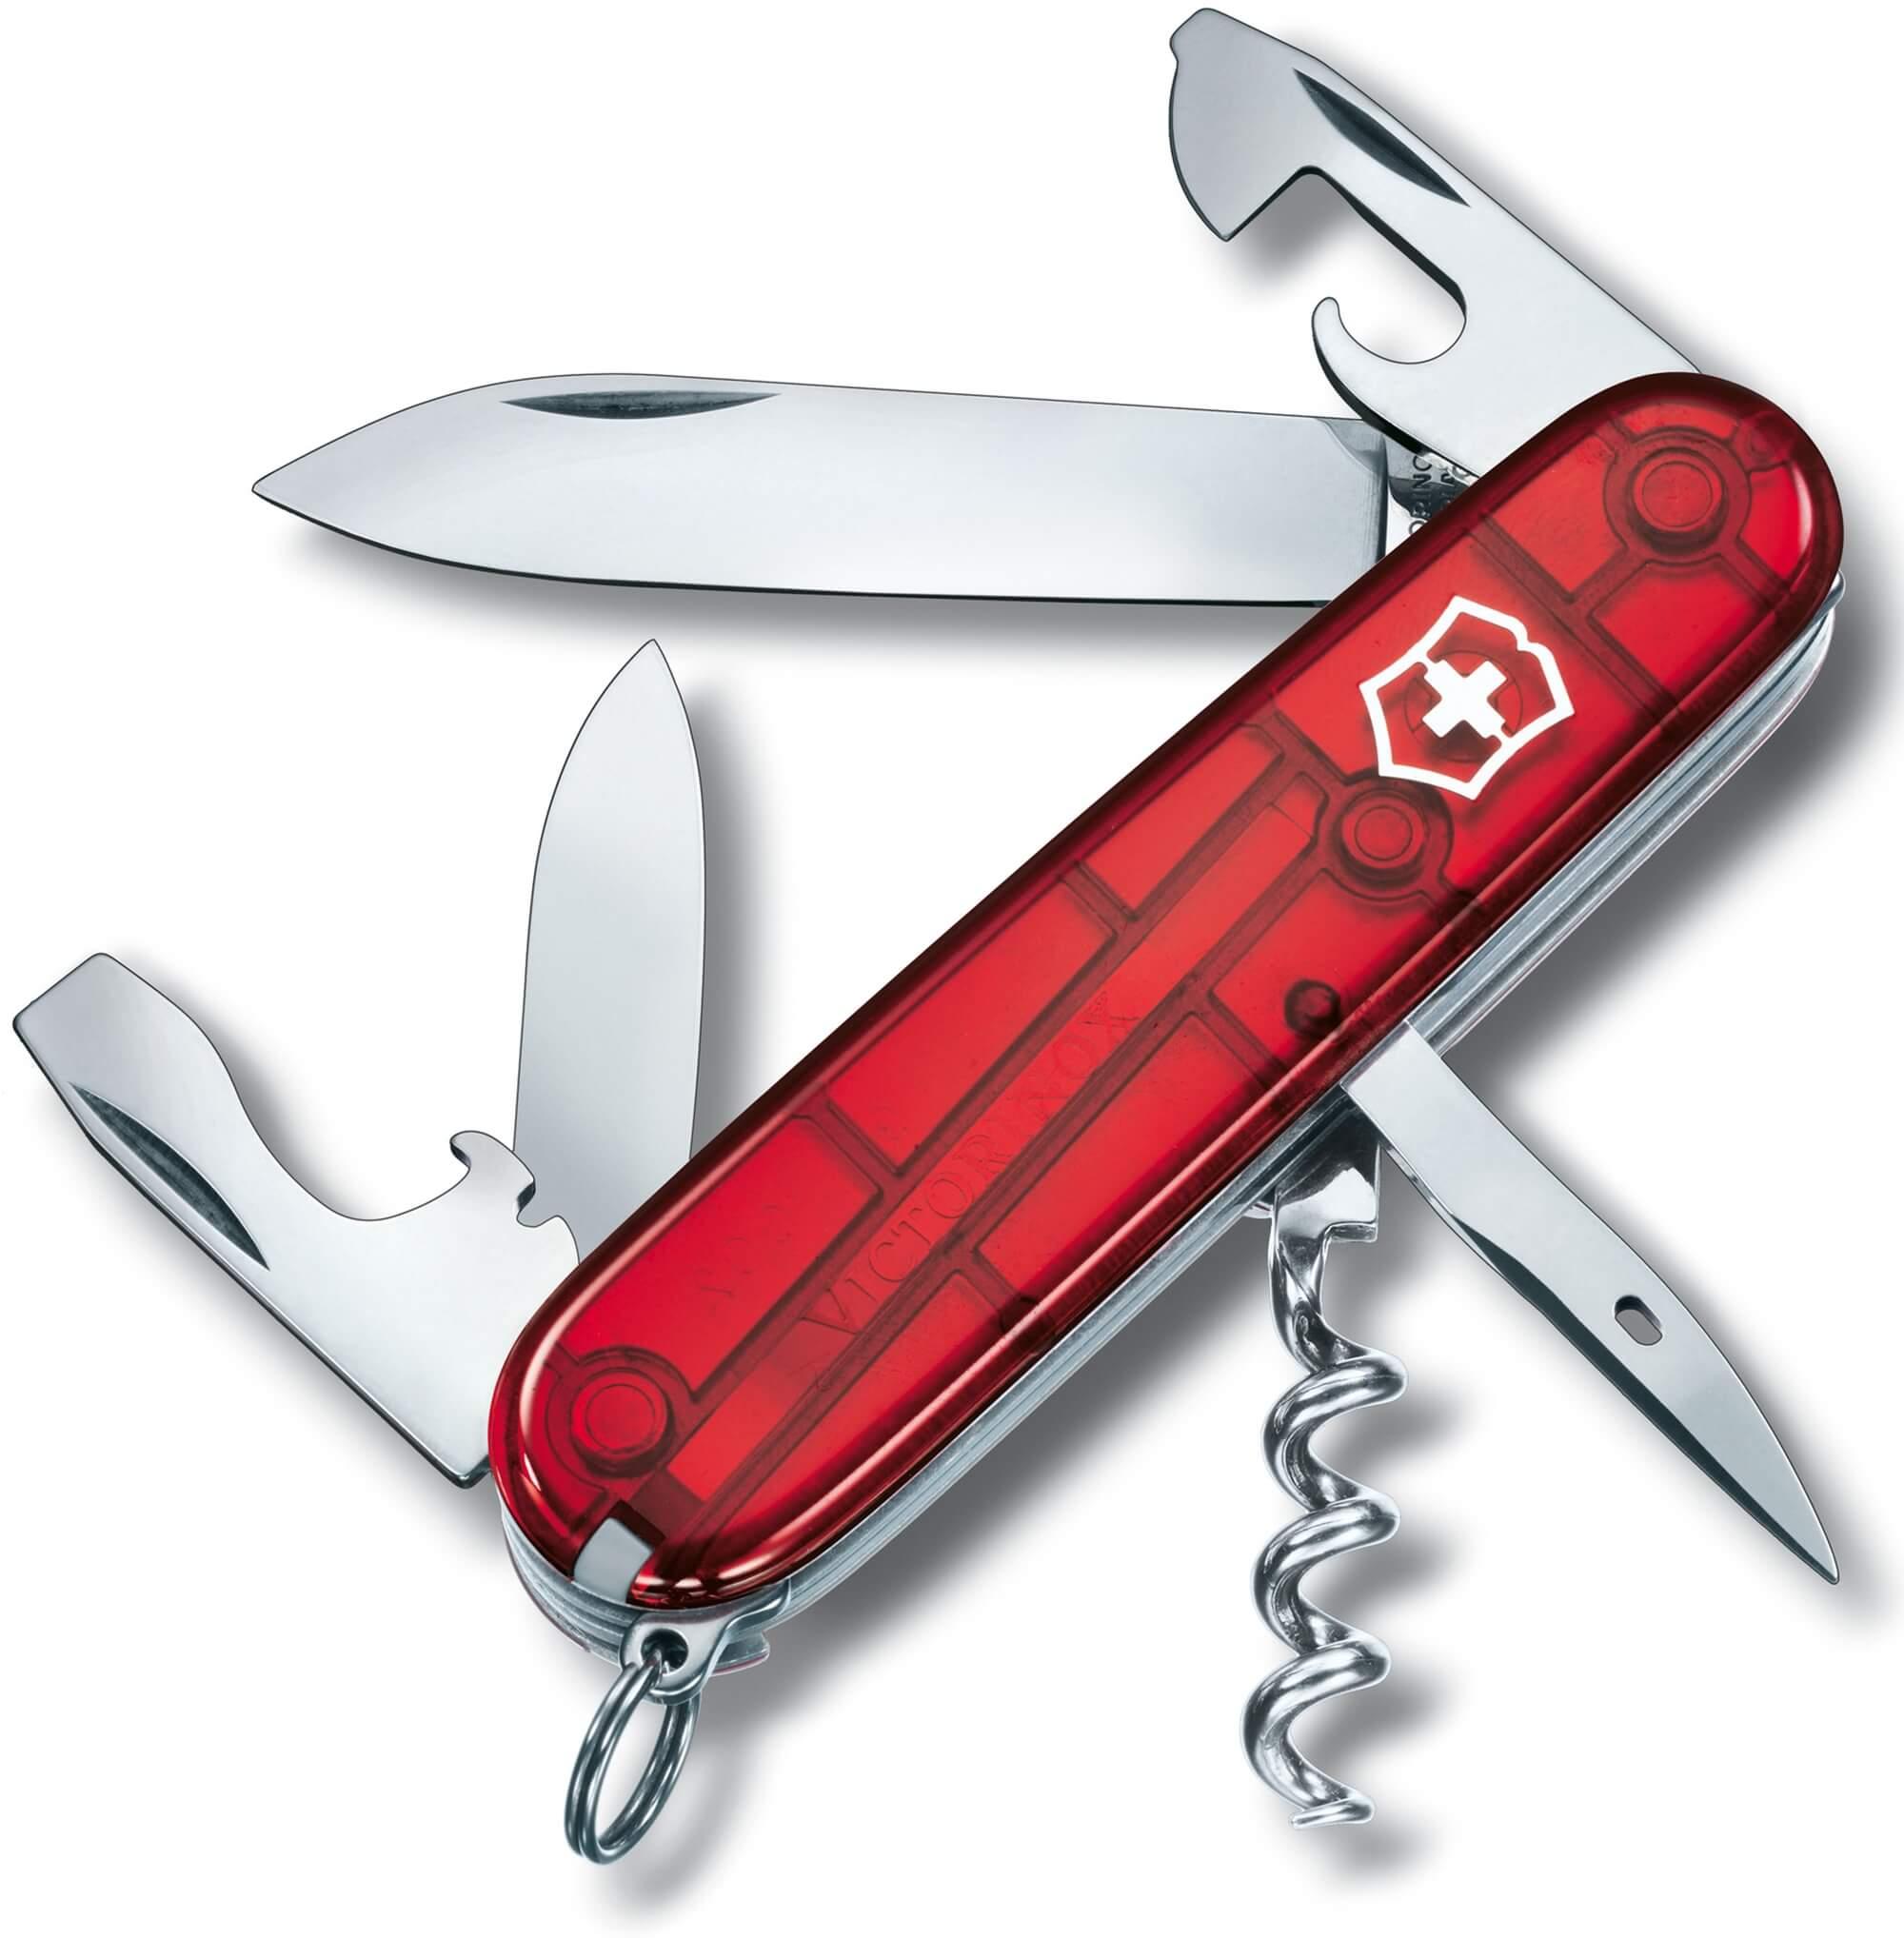 Canivete Spartan Vermelho Translúcido